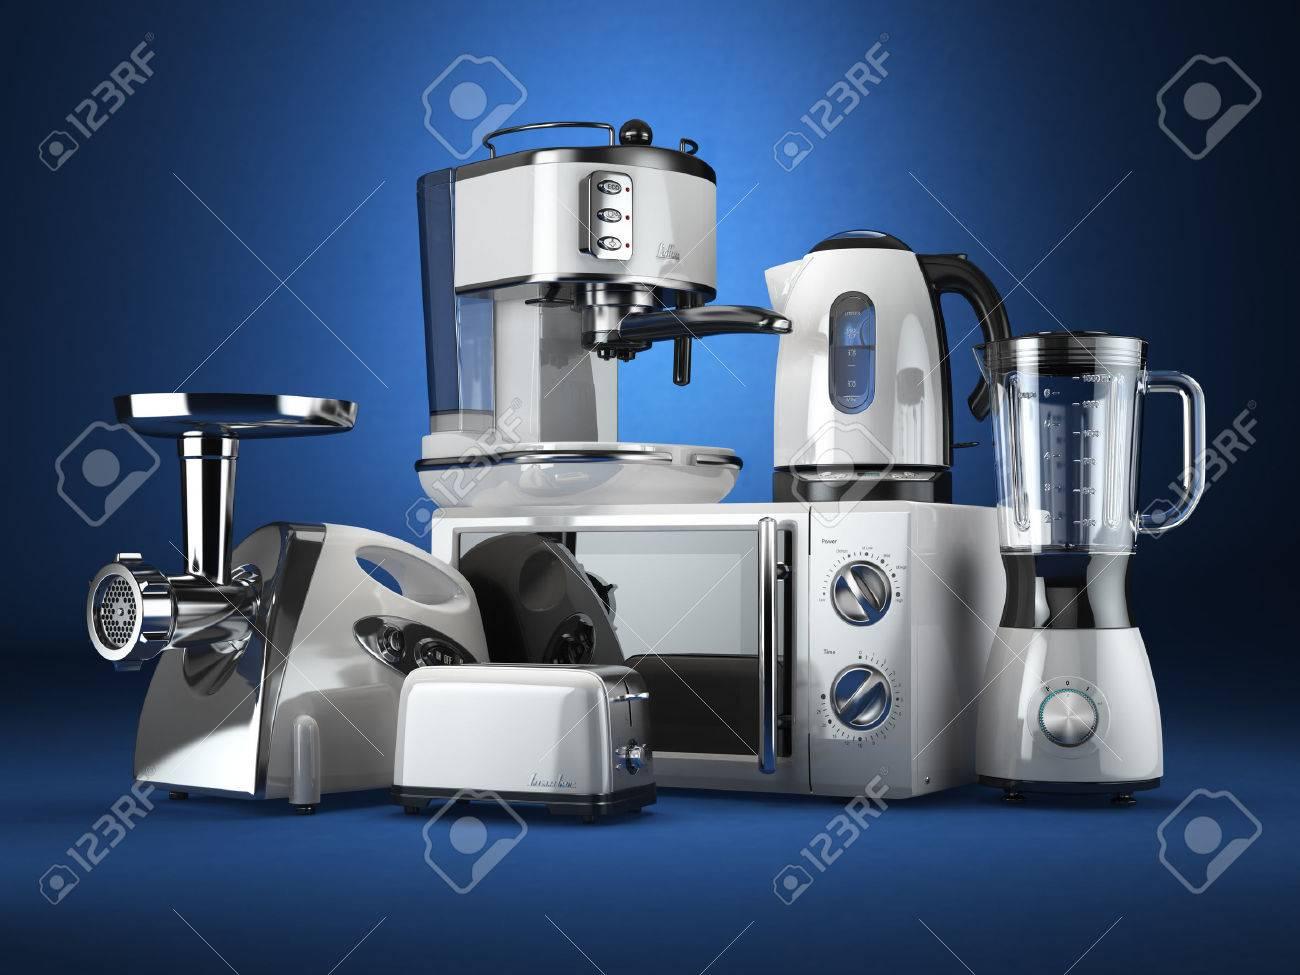 Elettrodomestici da cucina. Frullatore, tostapane, macchina per il caffè,  Ginder carne, forno a microonde e bollitore. 3d